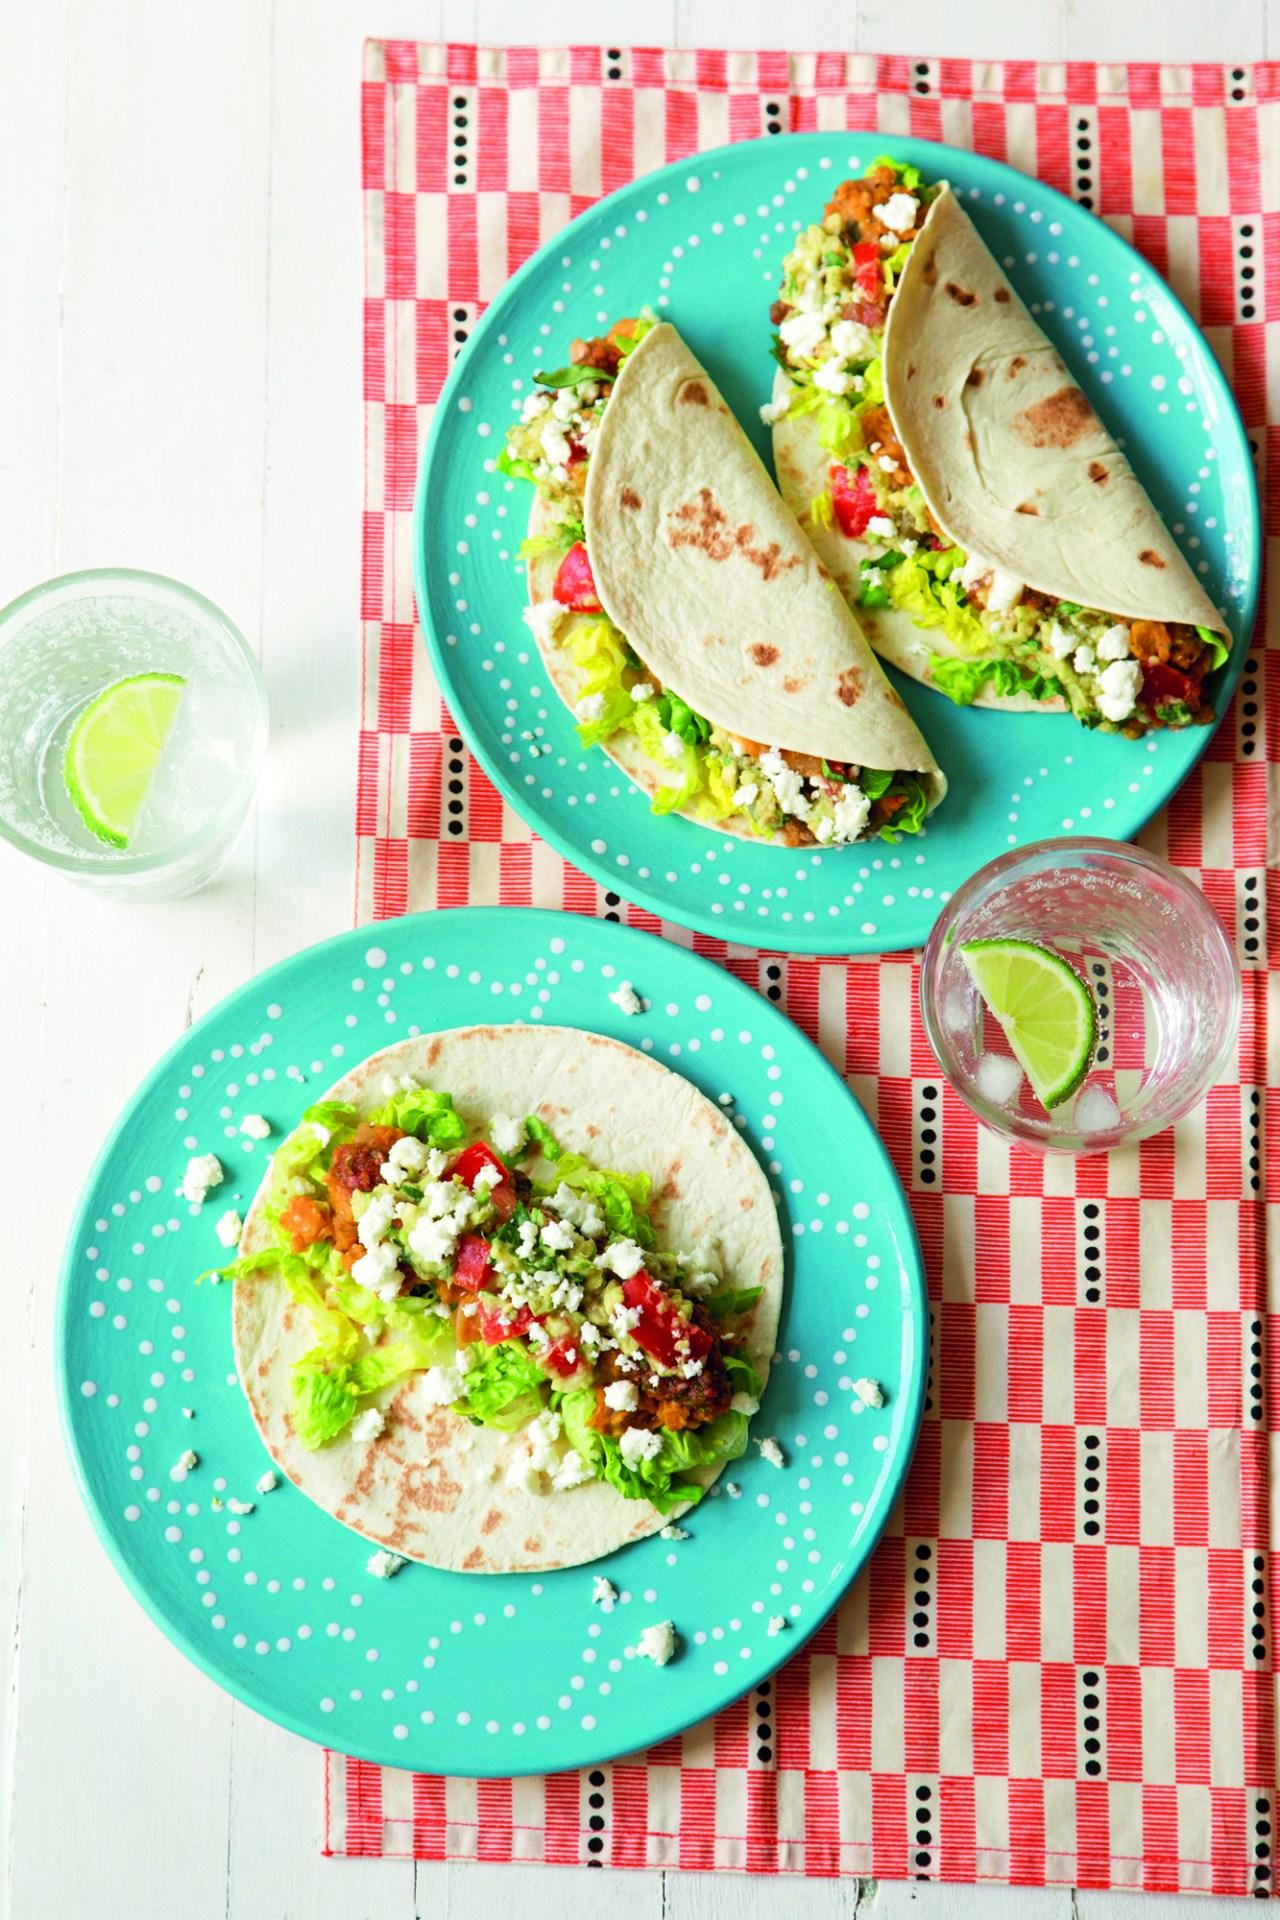 p139-HHH_Spicy Lentil Tacos